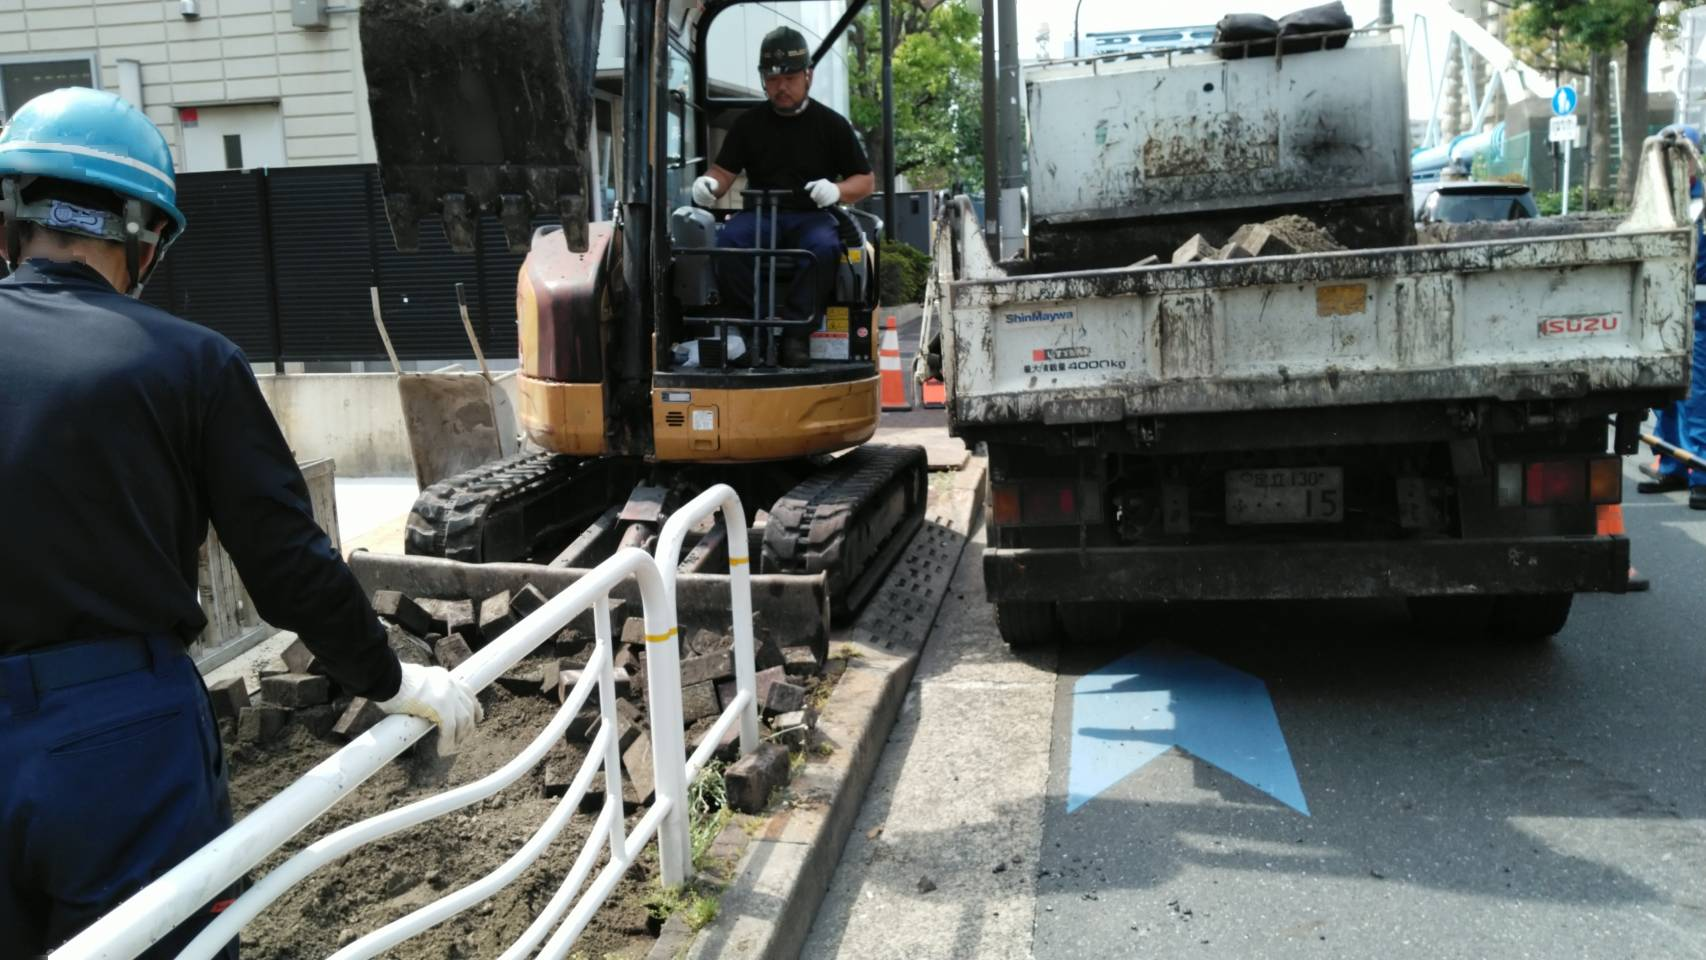 江東区内切り下げ工事及び江戸川区東小松川L形取替工事